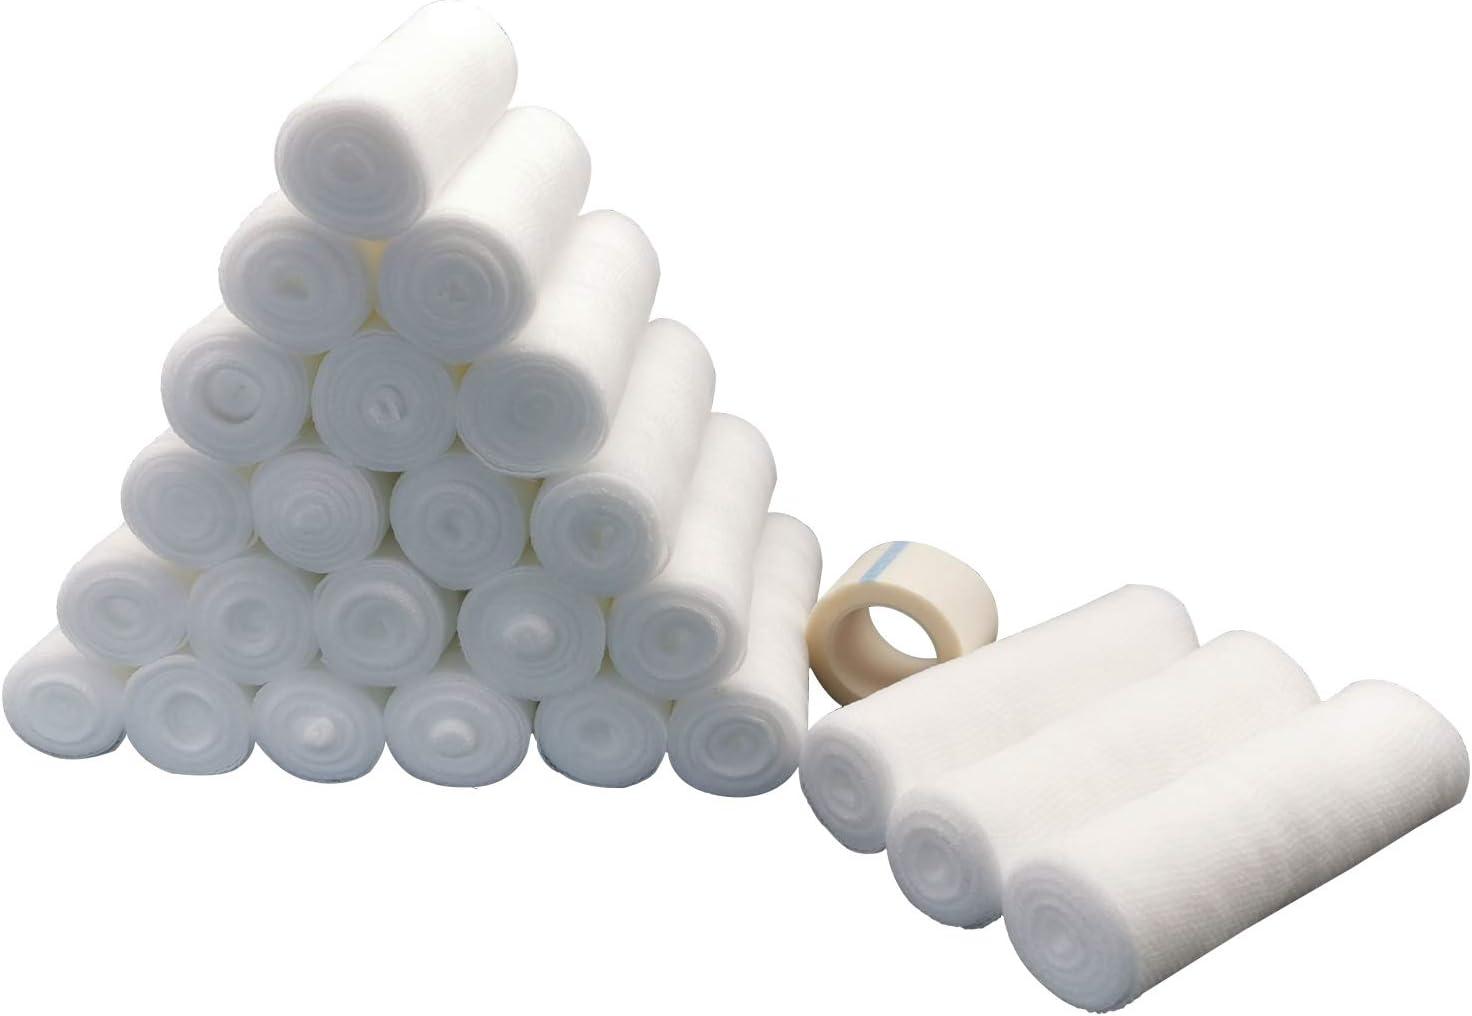 ZJCCTO Medical Award-winning store 24 Bulk Sale SALE% OFF Gauze Stretch Inch Bandage x 4 Ya Roll